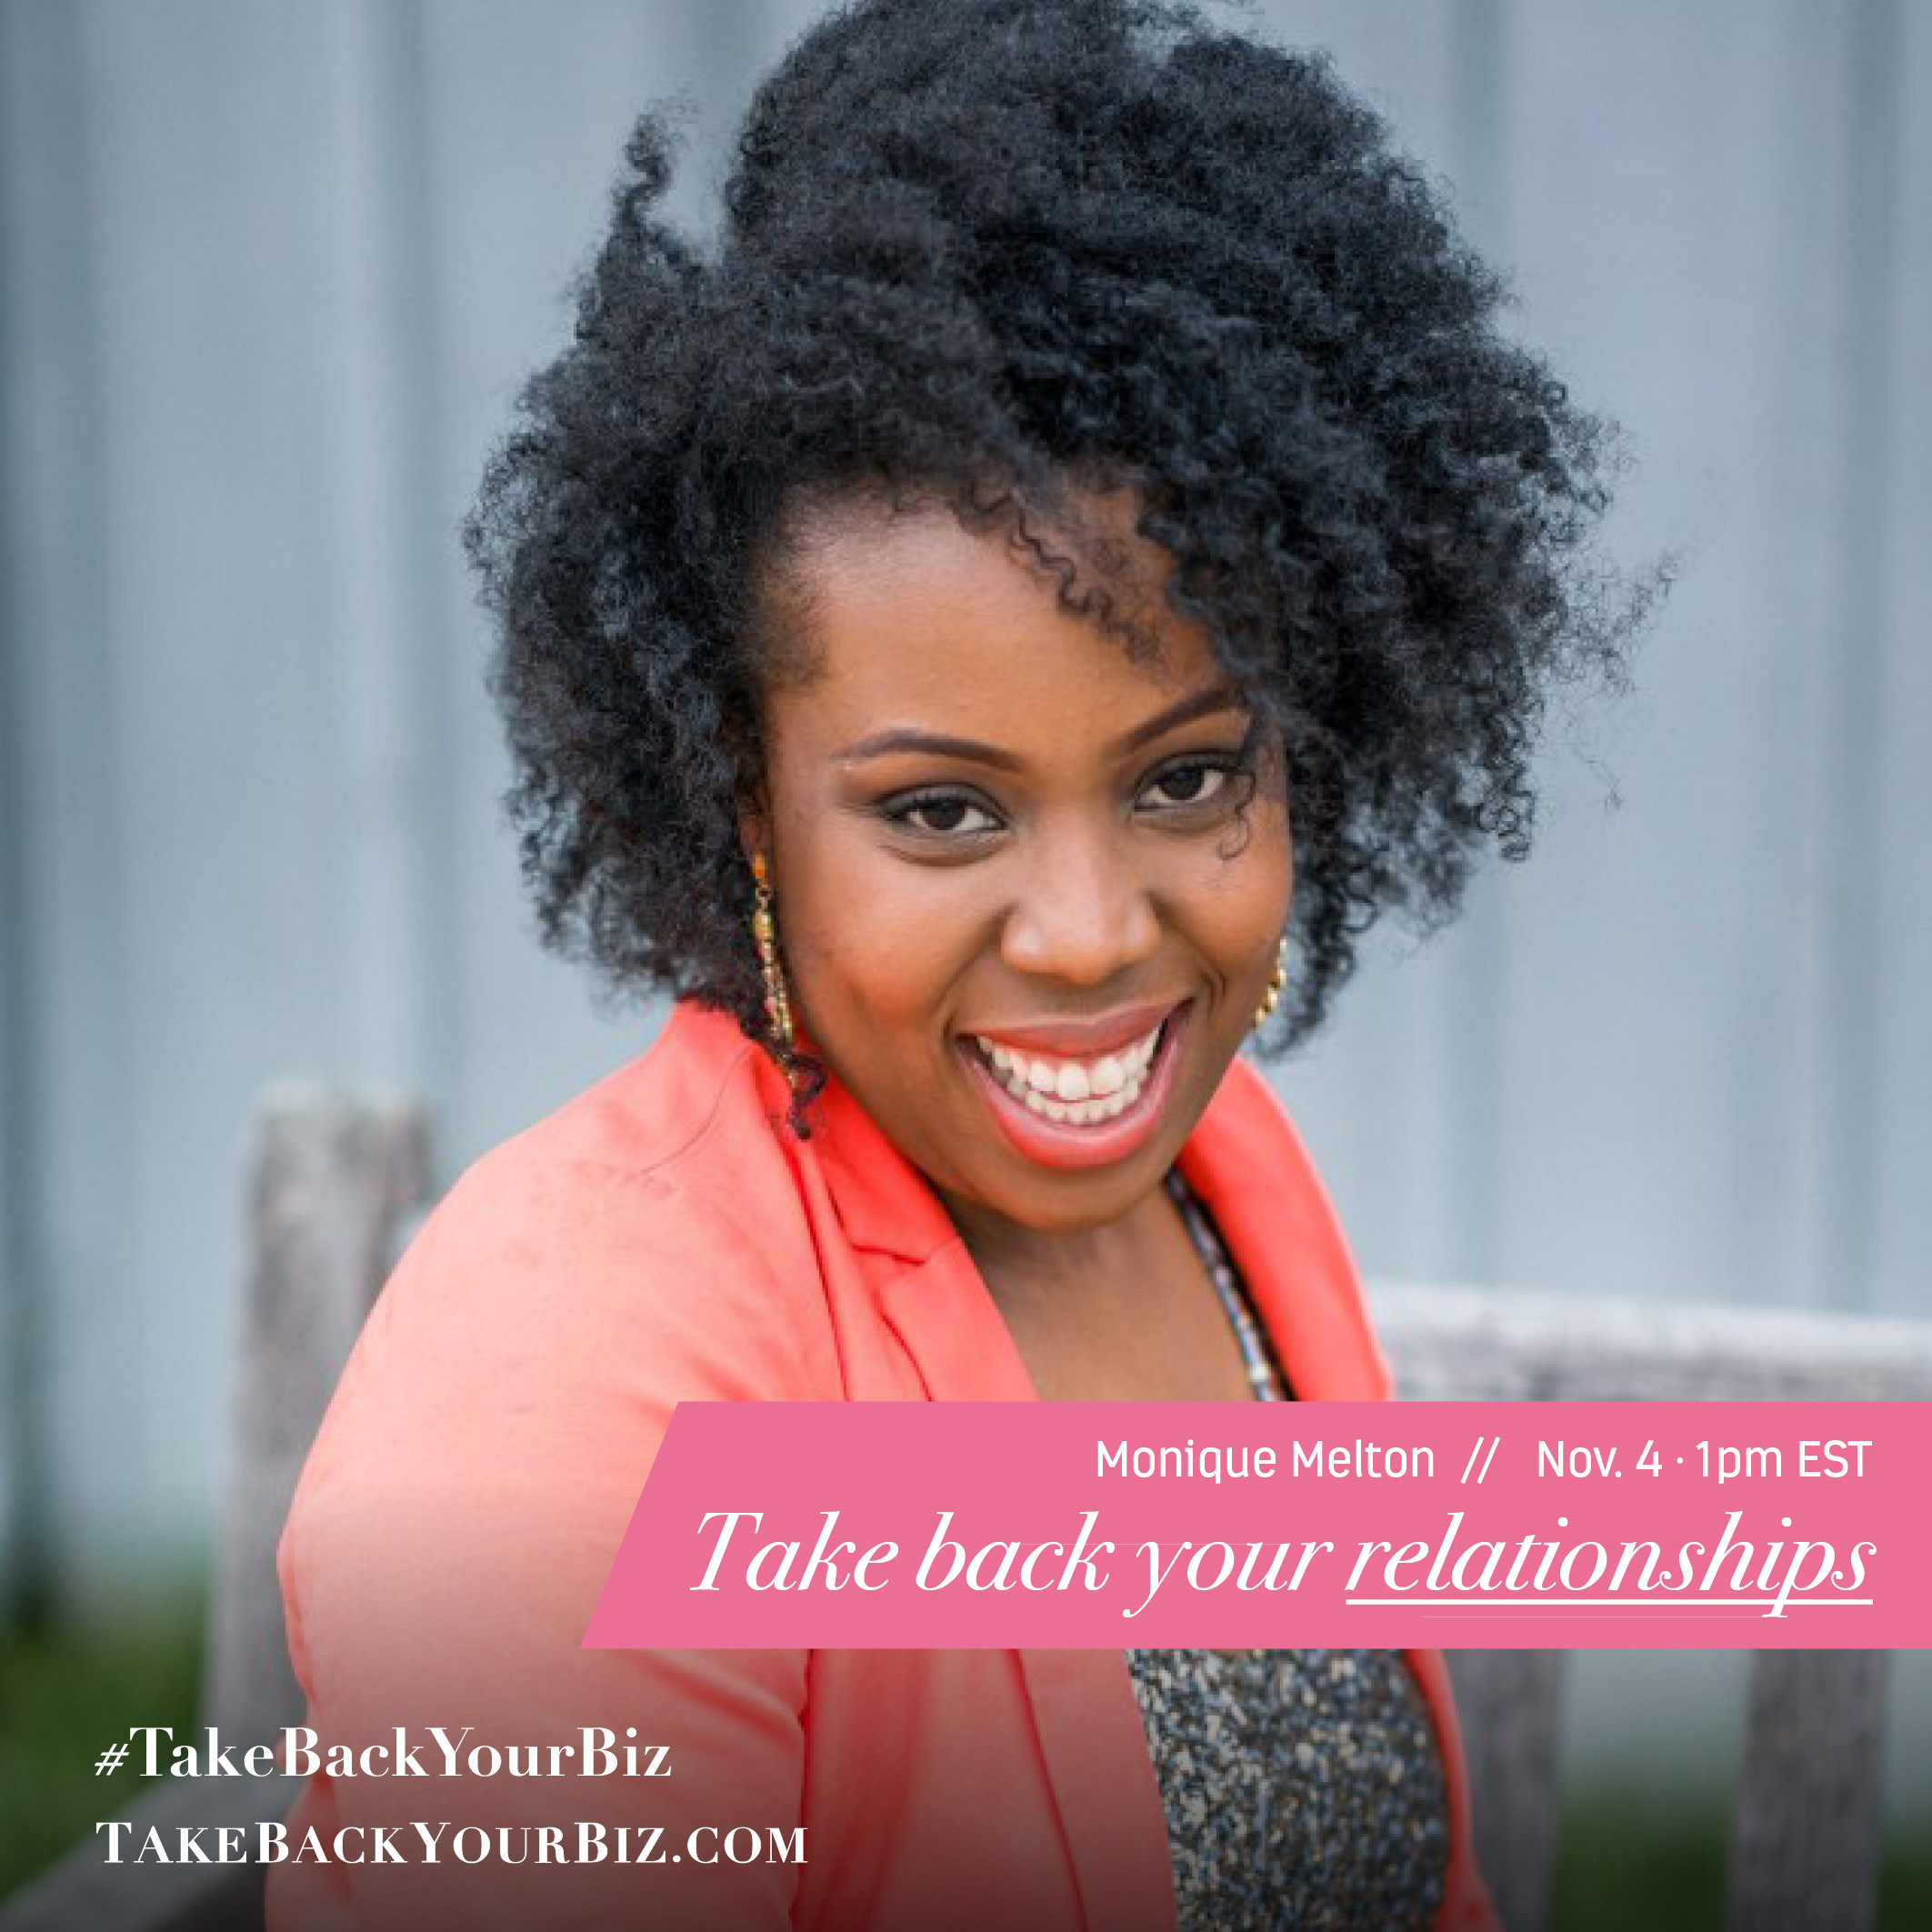 Take-Back-Your-Biz-Speakers-Monique-Melton